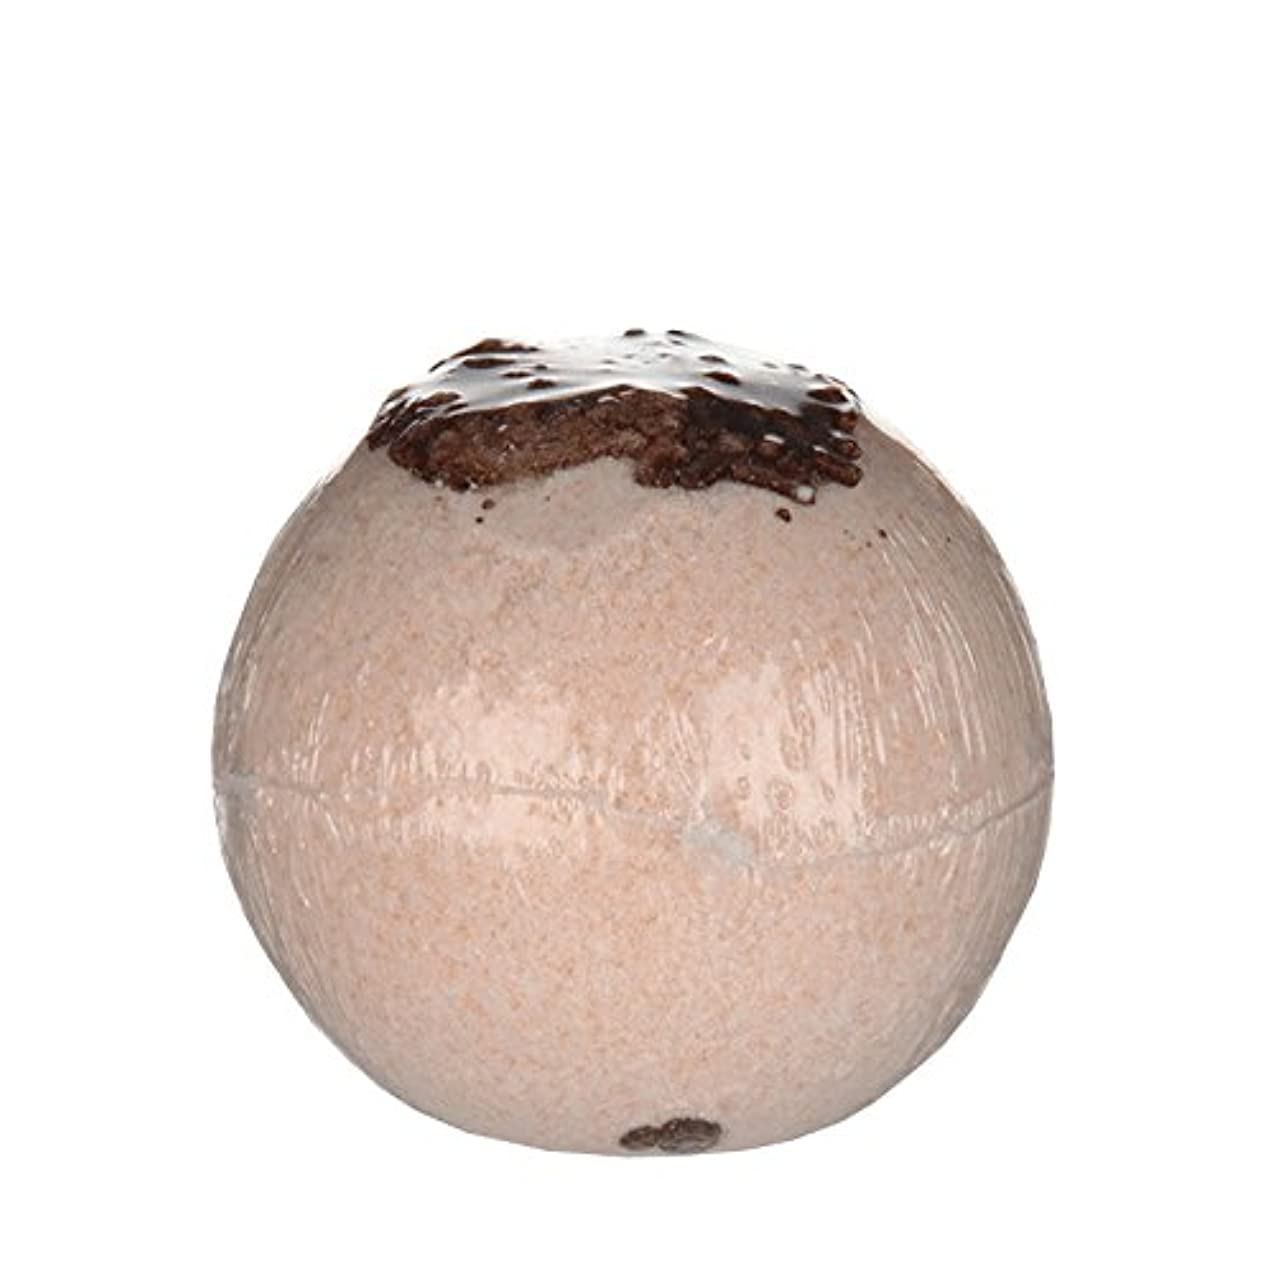 Treets Bath Ball Coconut Chocolate 170g (Pack of 2) - Treetsバスボールココナッツチョコレート170グラム (x2) [並行輸入品]